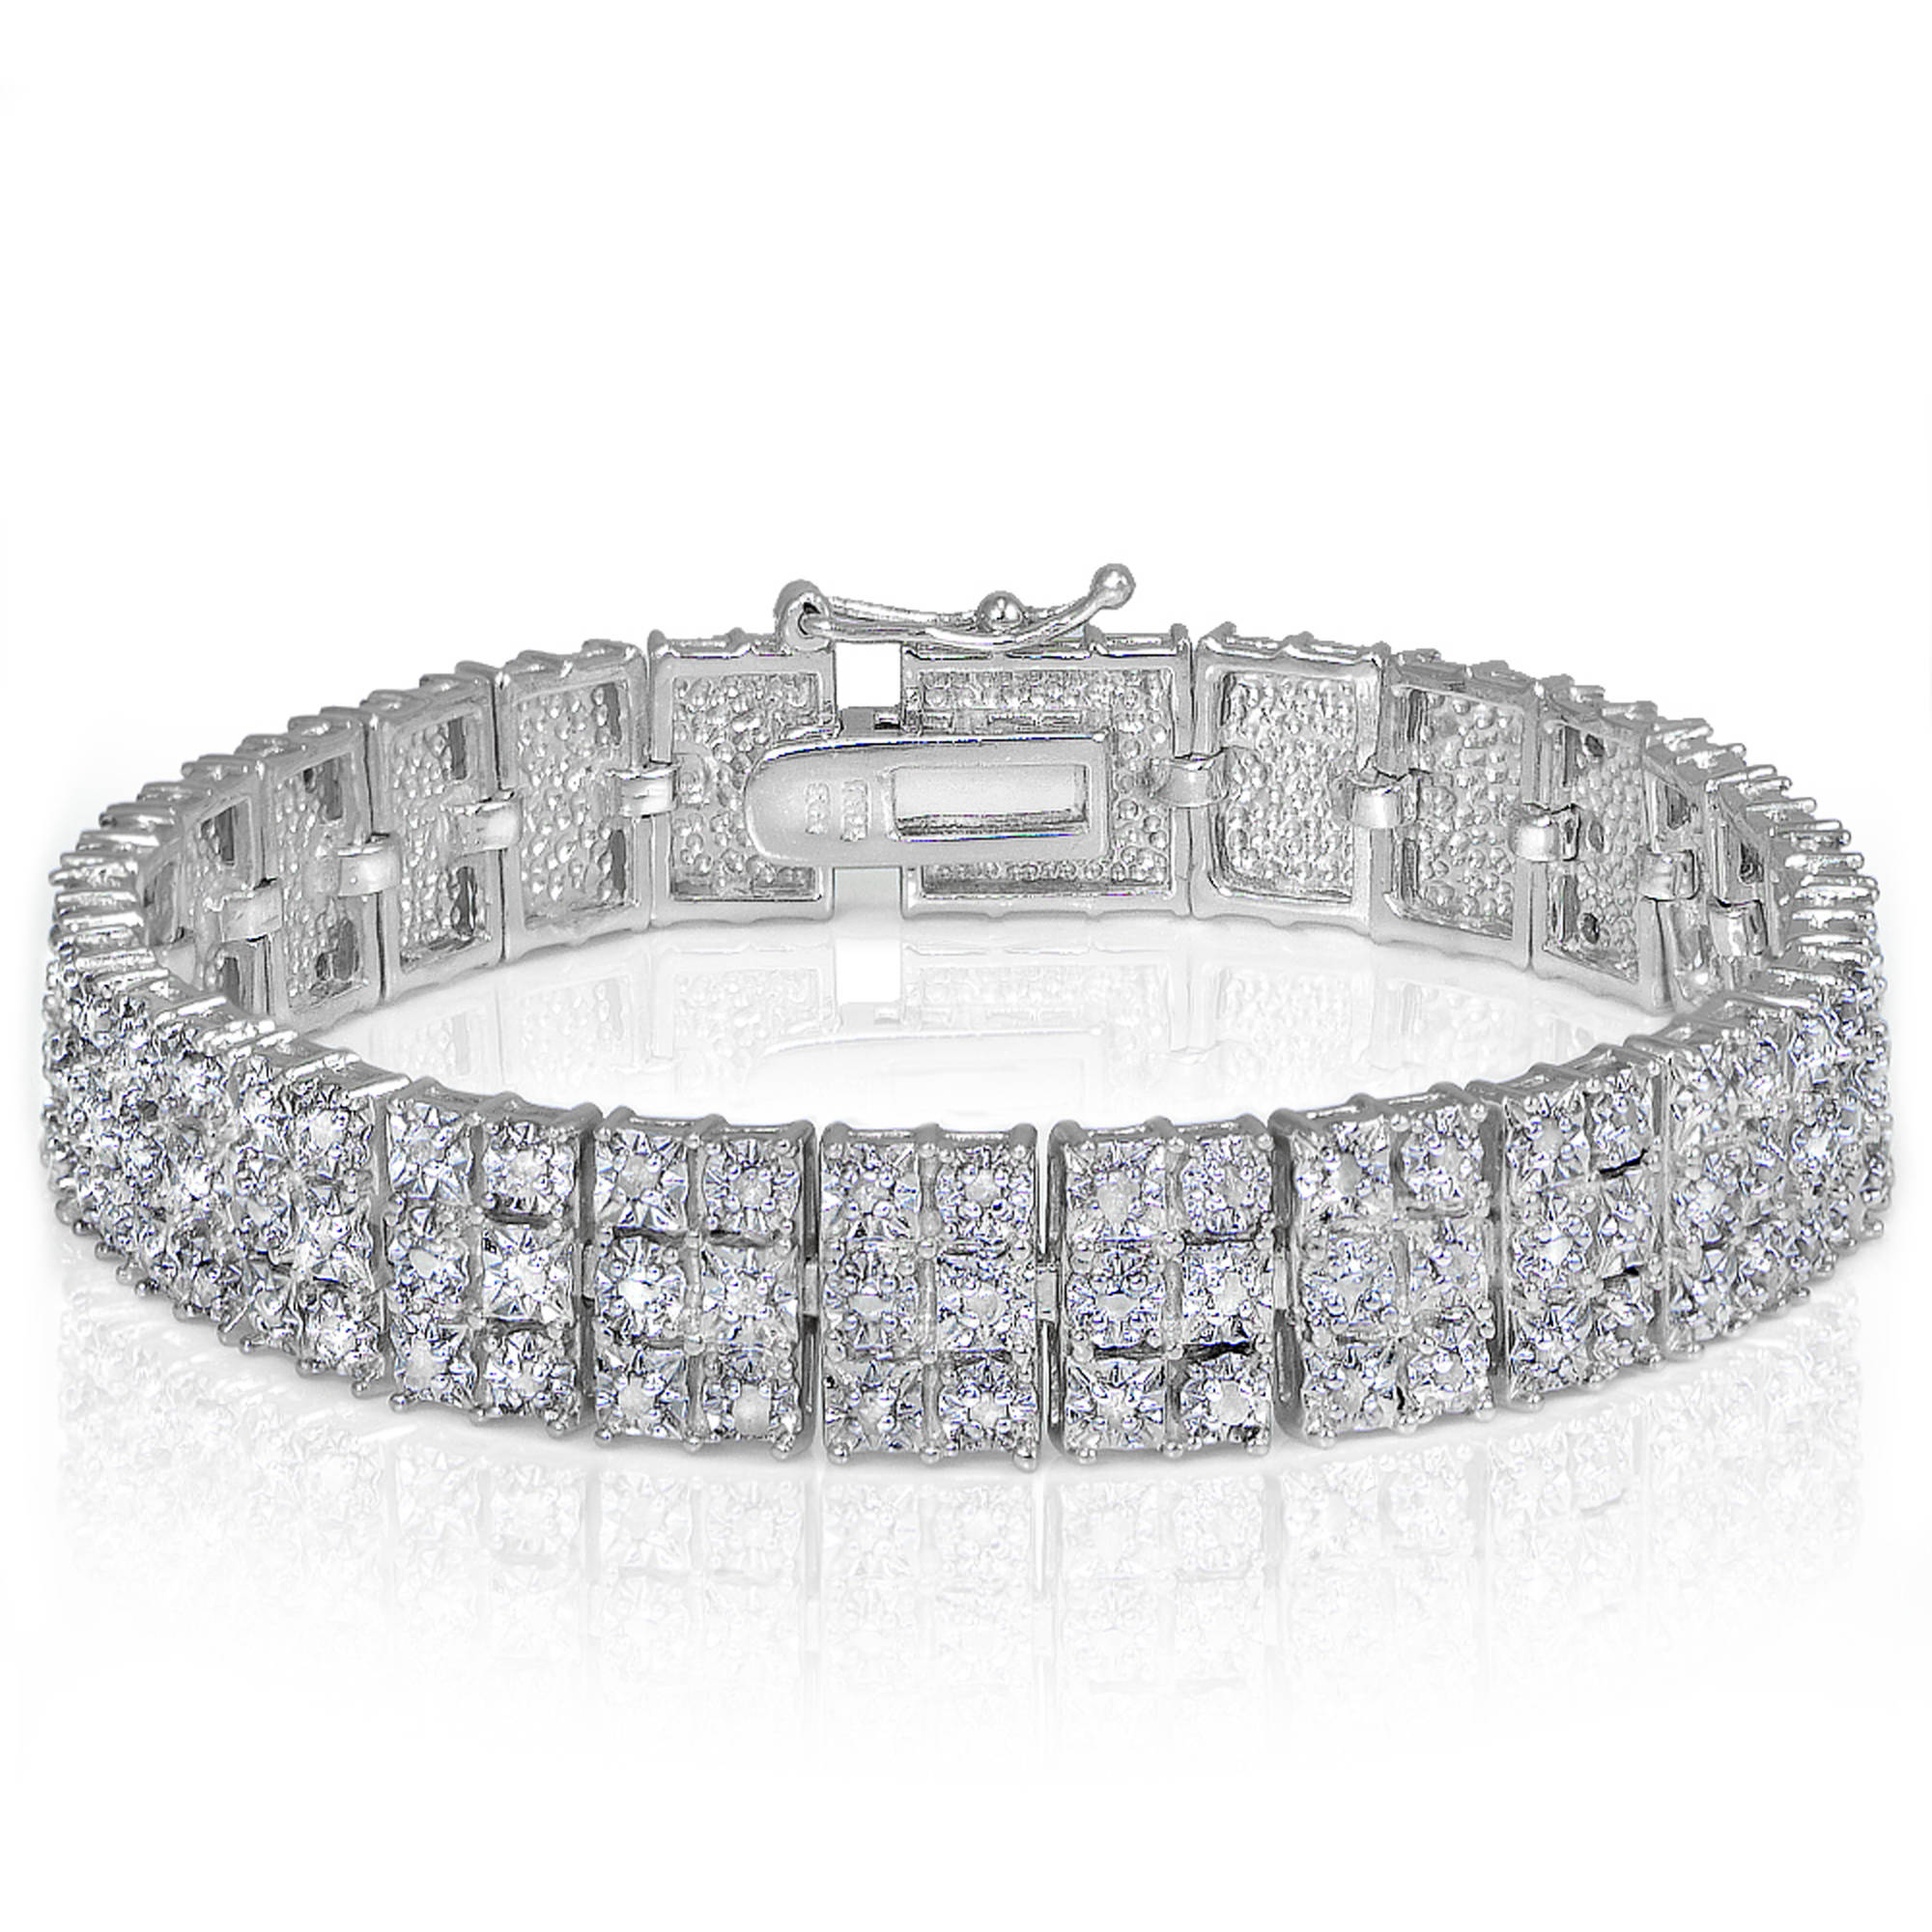 1 Carat T.W. Diamond Silver-Tone Miracle-Set 3-Row Tennis Bracelet by Generic